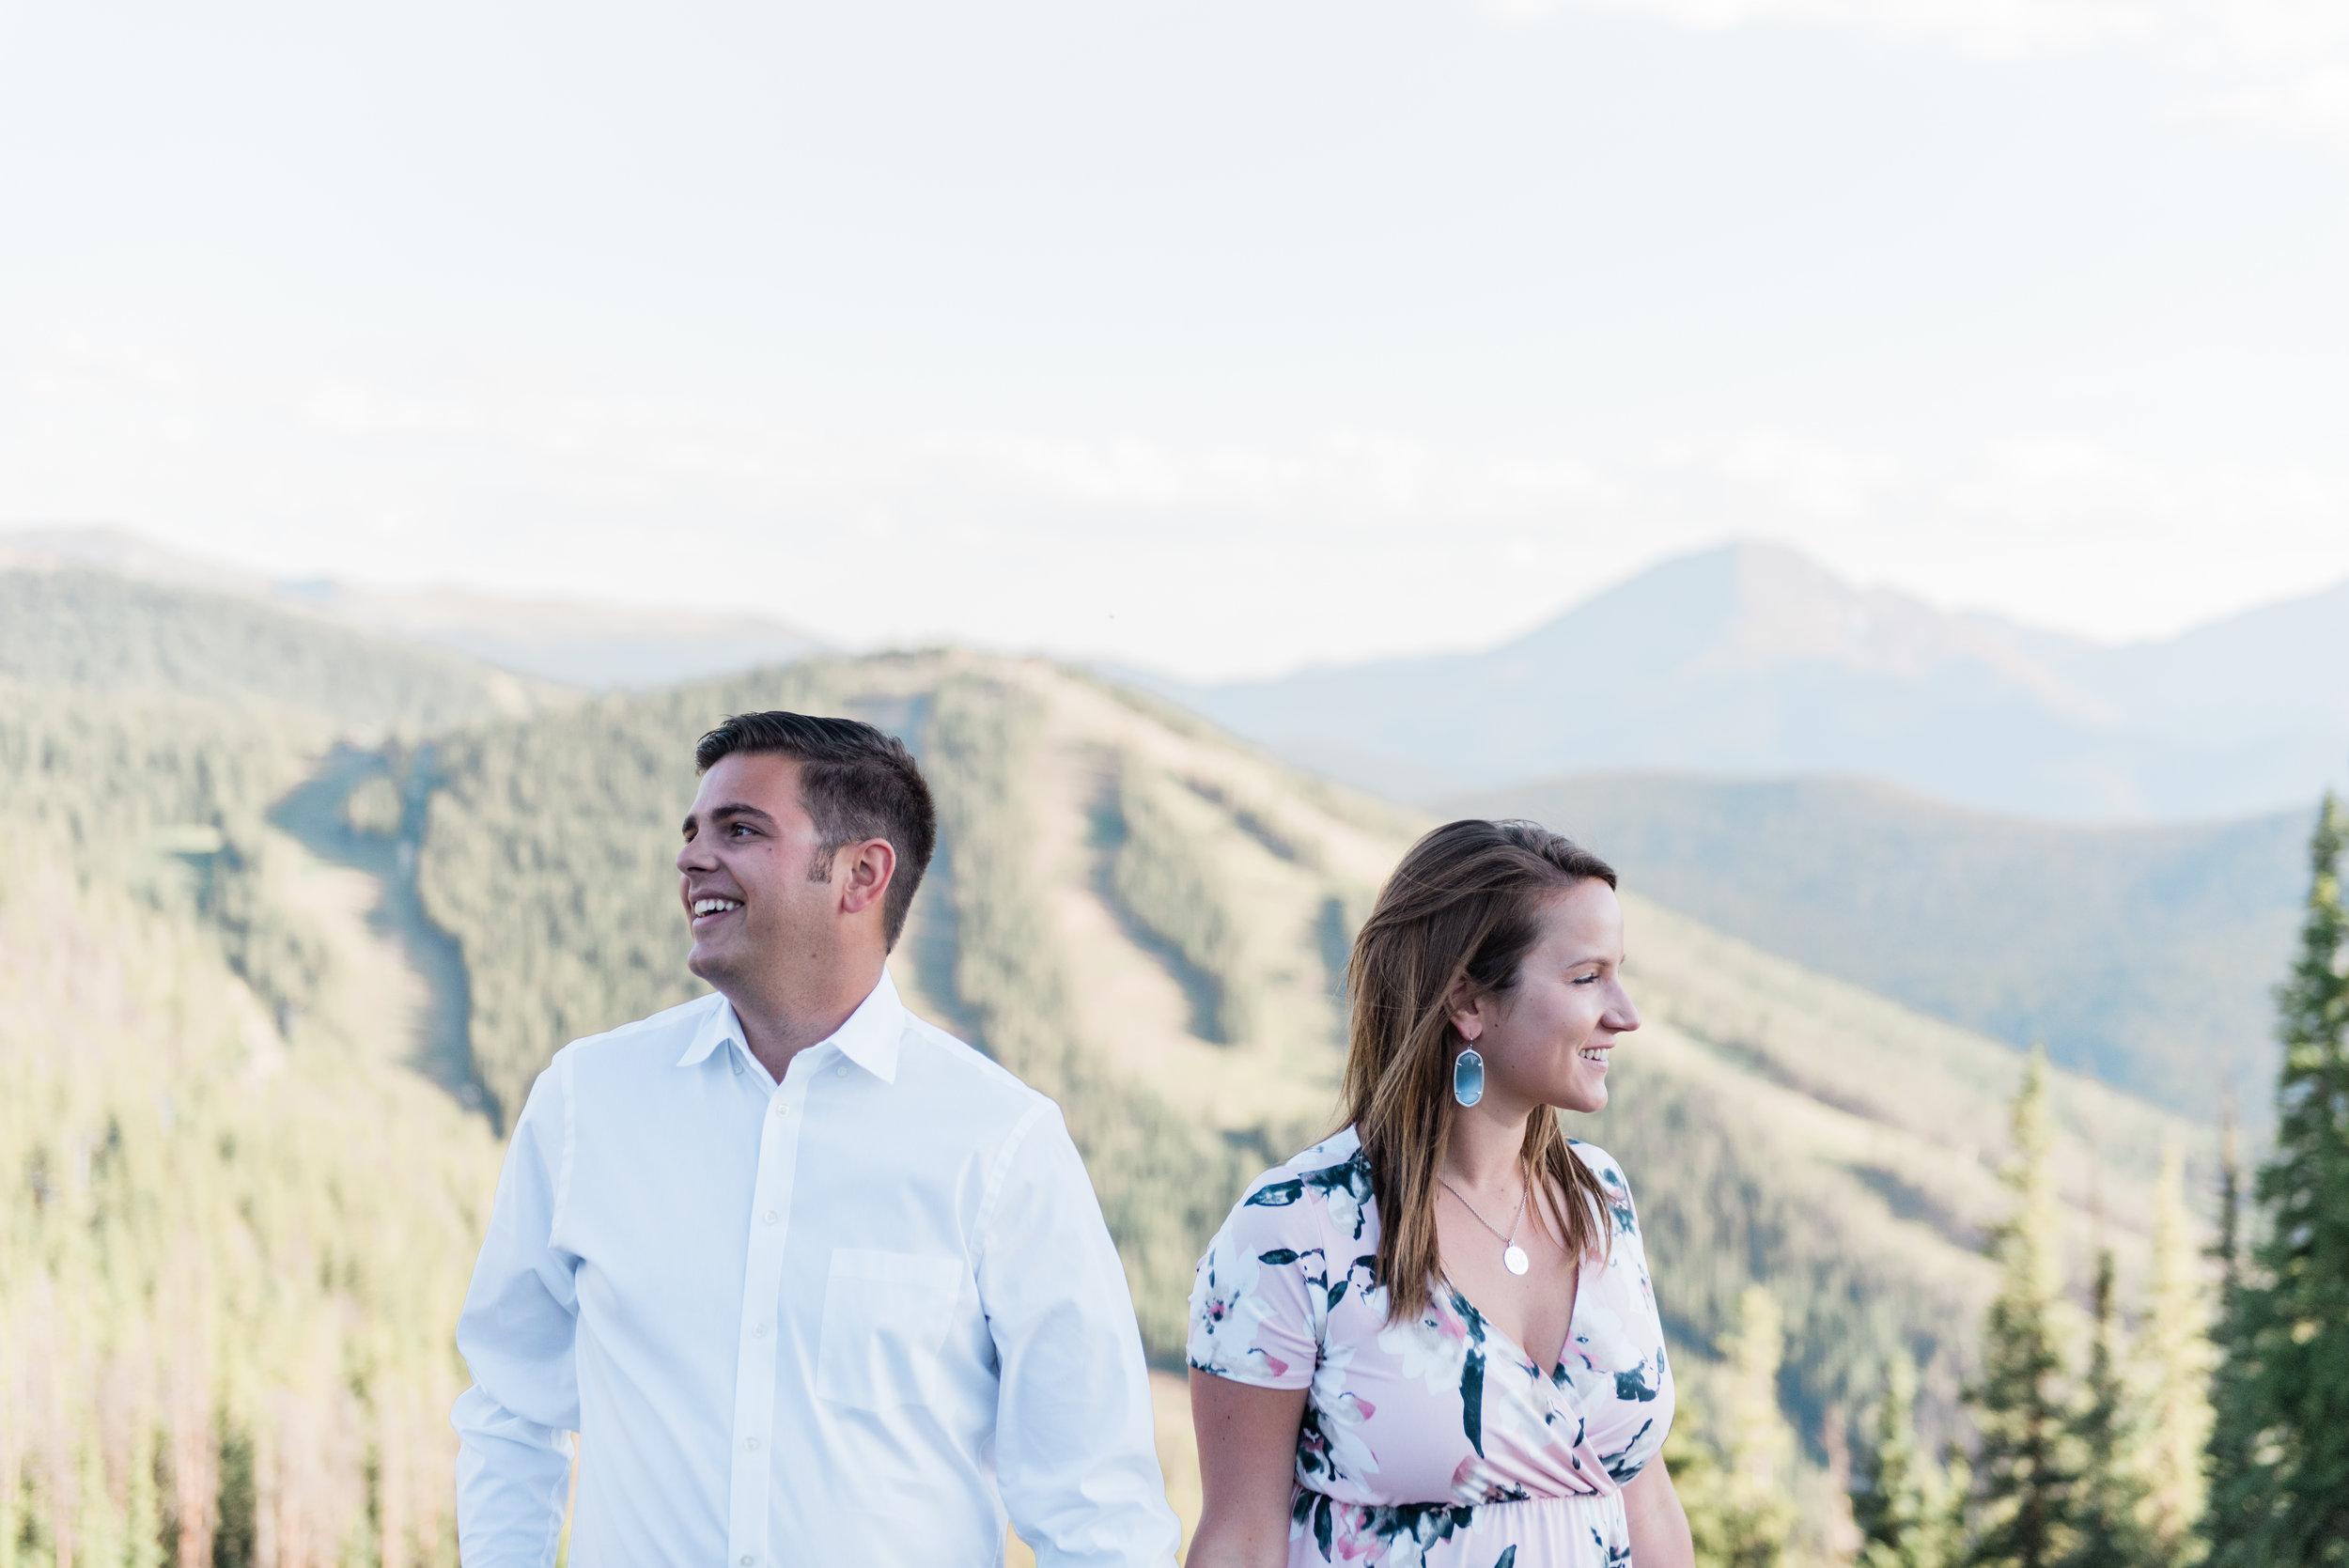 AshleighMillerPhotography-Adventure-Photography-Session-Elle-Christian-Colorado-21.jpg